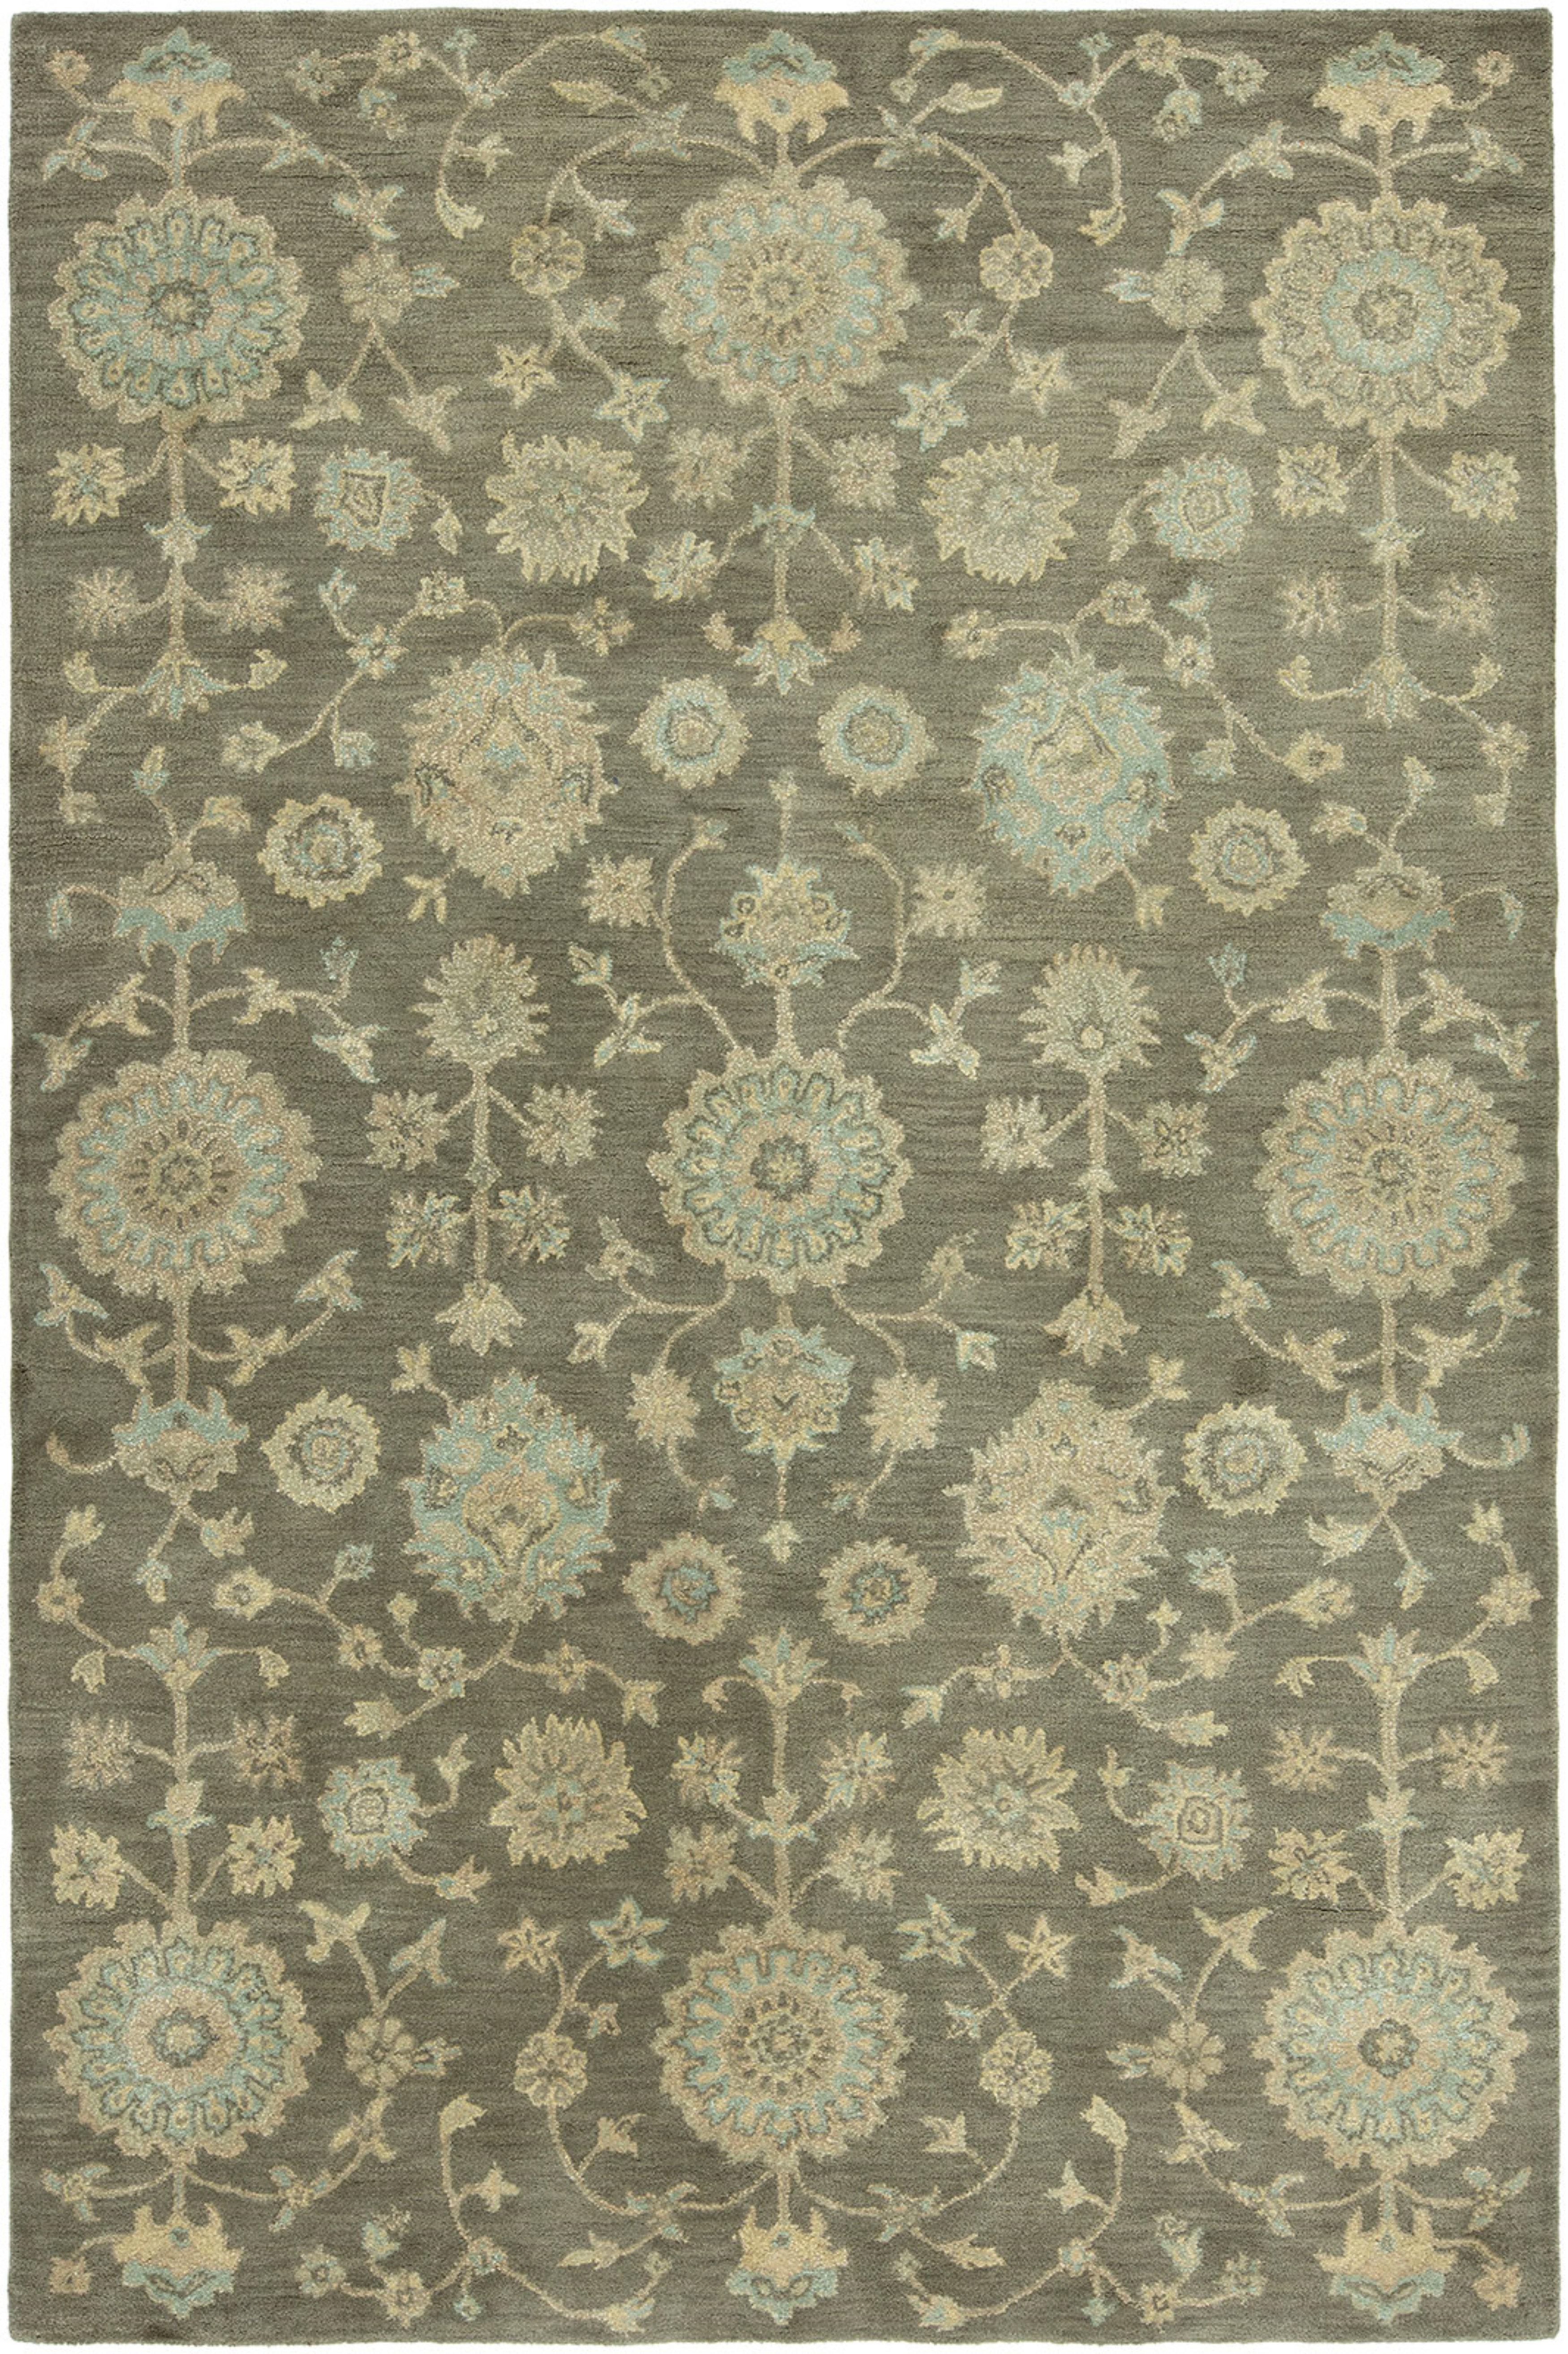 Charlton Home Gravette Floral Handmade Tufted Wool Mineral Blue Area Rug Wayfair Ca